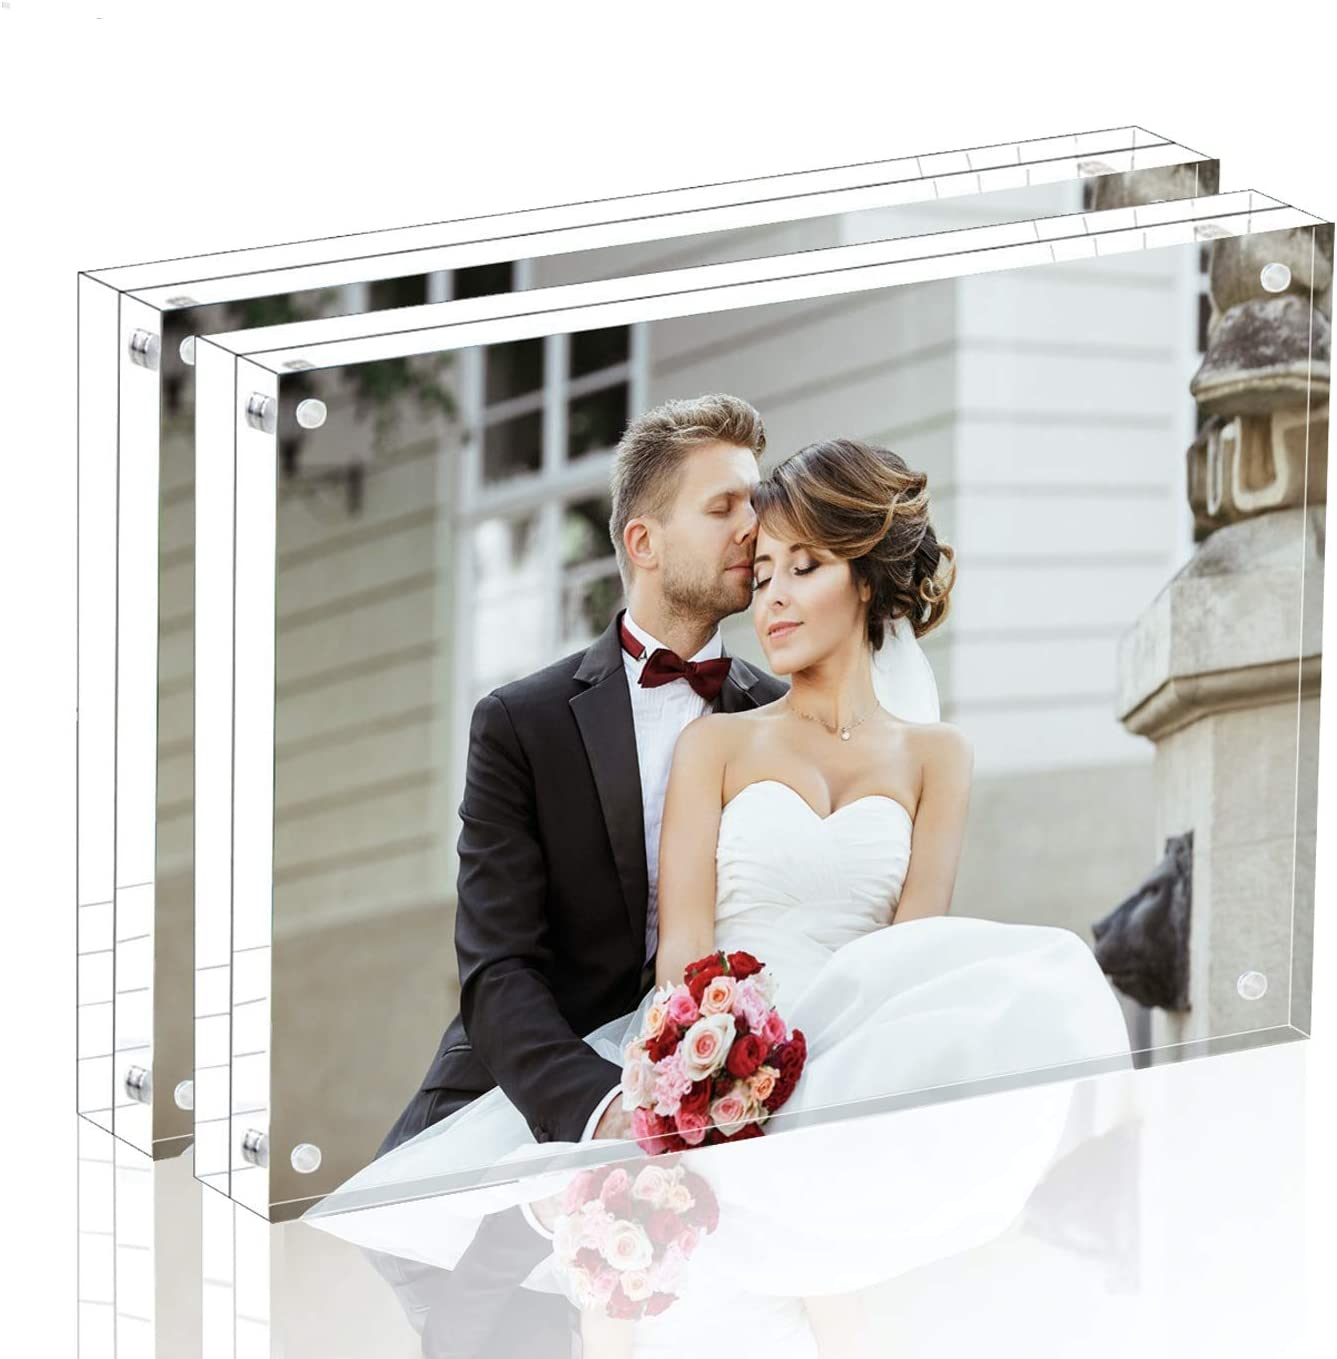 Amazon Com Magicool Premium Acrylic Photo Frame Magnet Photo Frame Double Sied Thick Desktop Frames 5x7 2 Pack